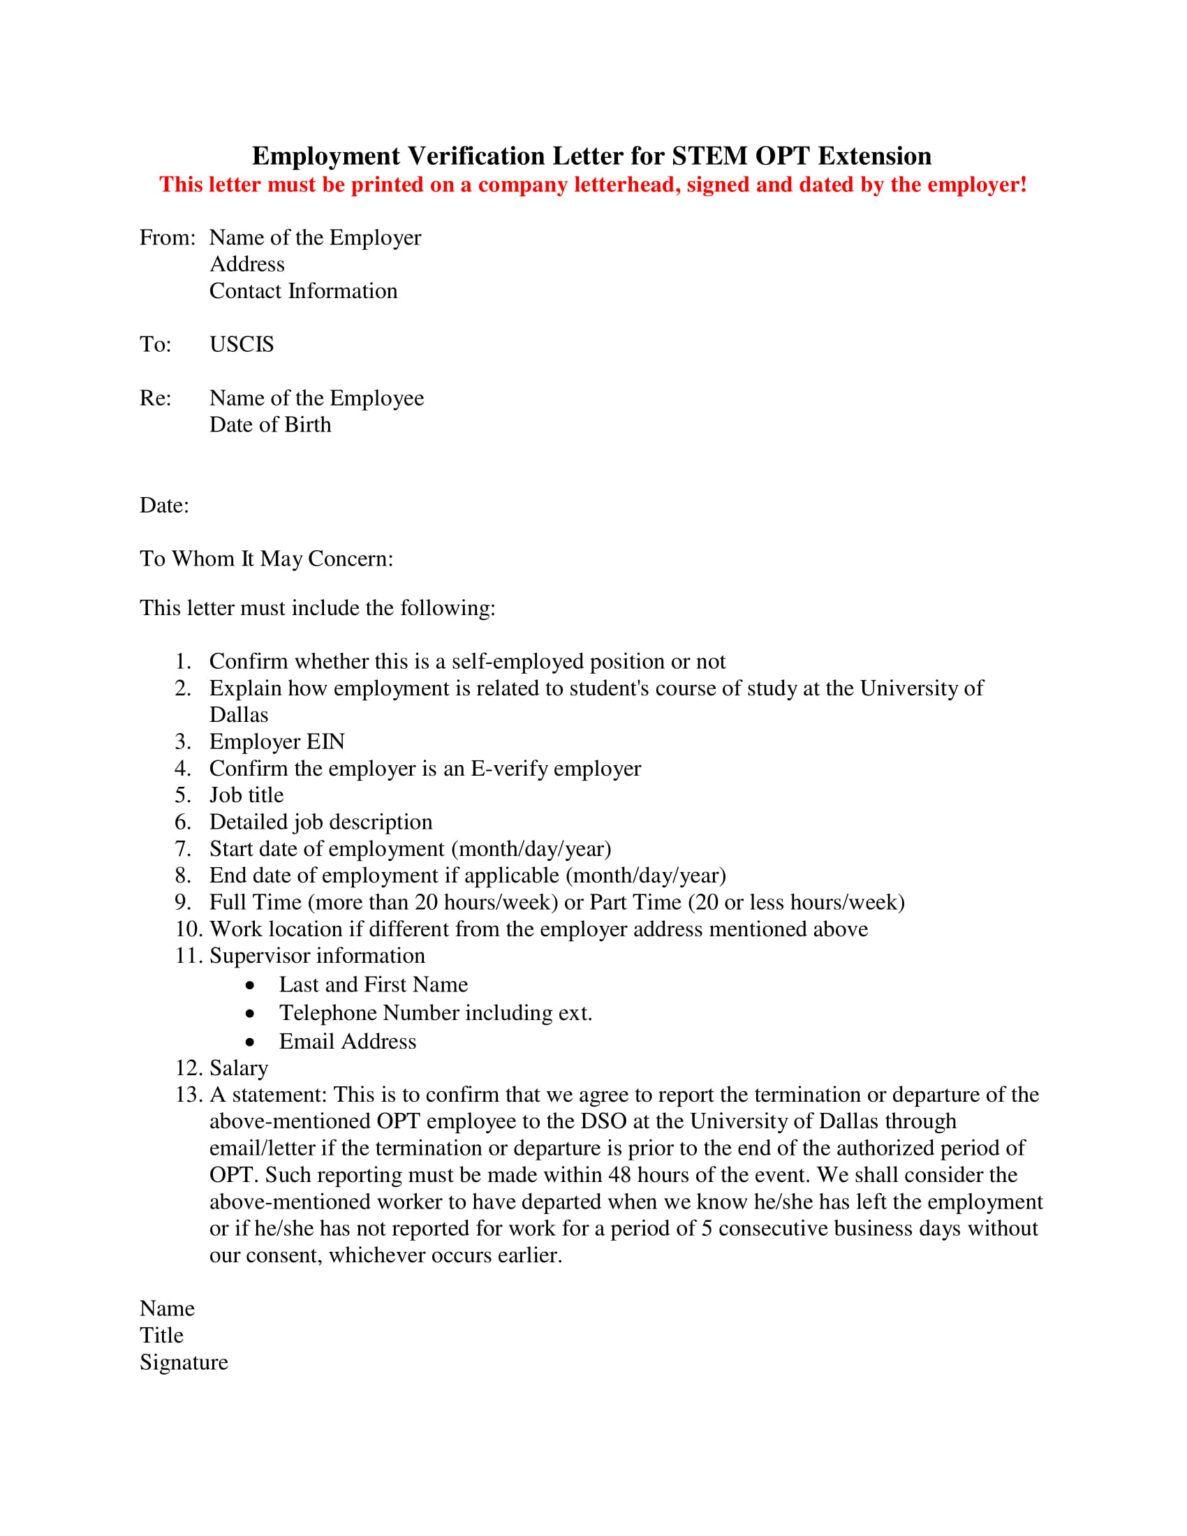 14 Employment Verification Letter Examples Pdf Doc Inside Employment Verification L Letter Template Word Letter Example Cover Letter Example Administrative